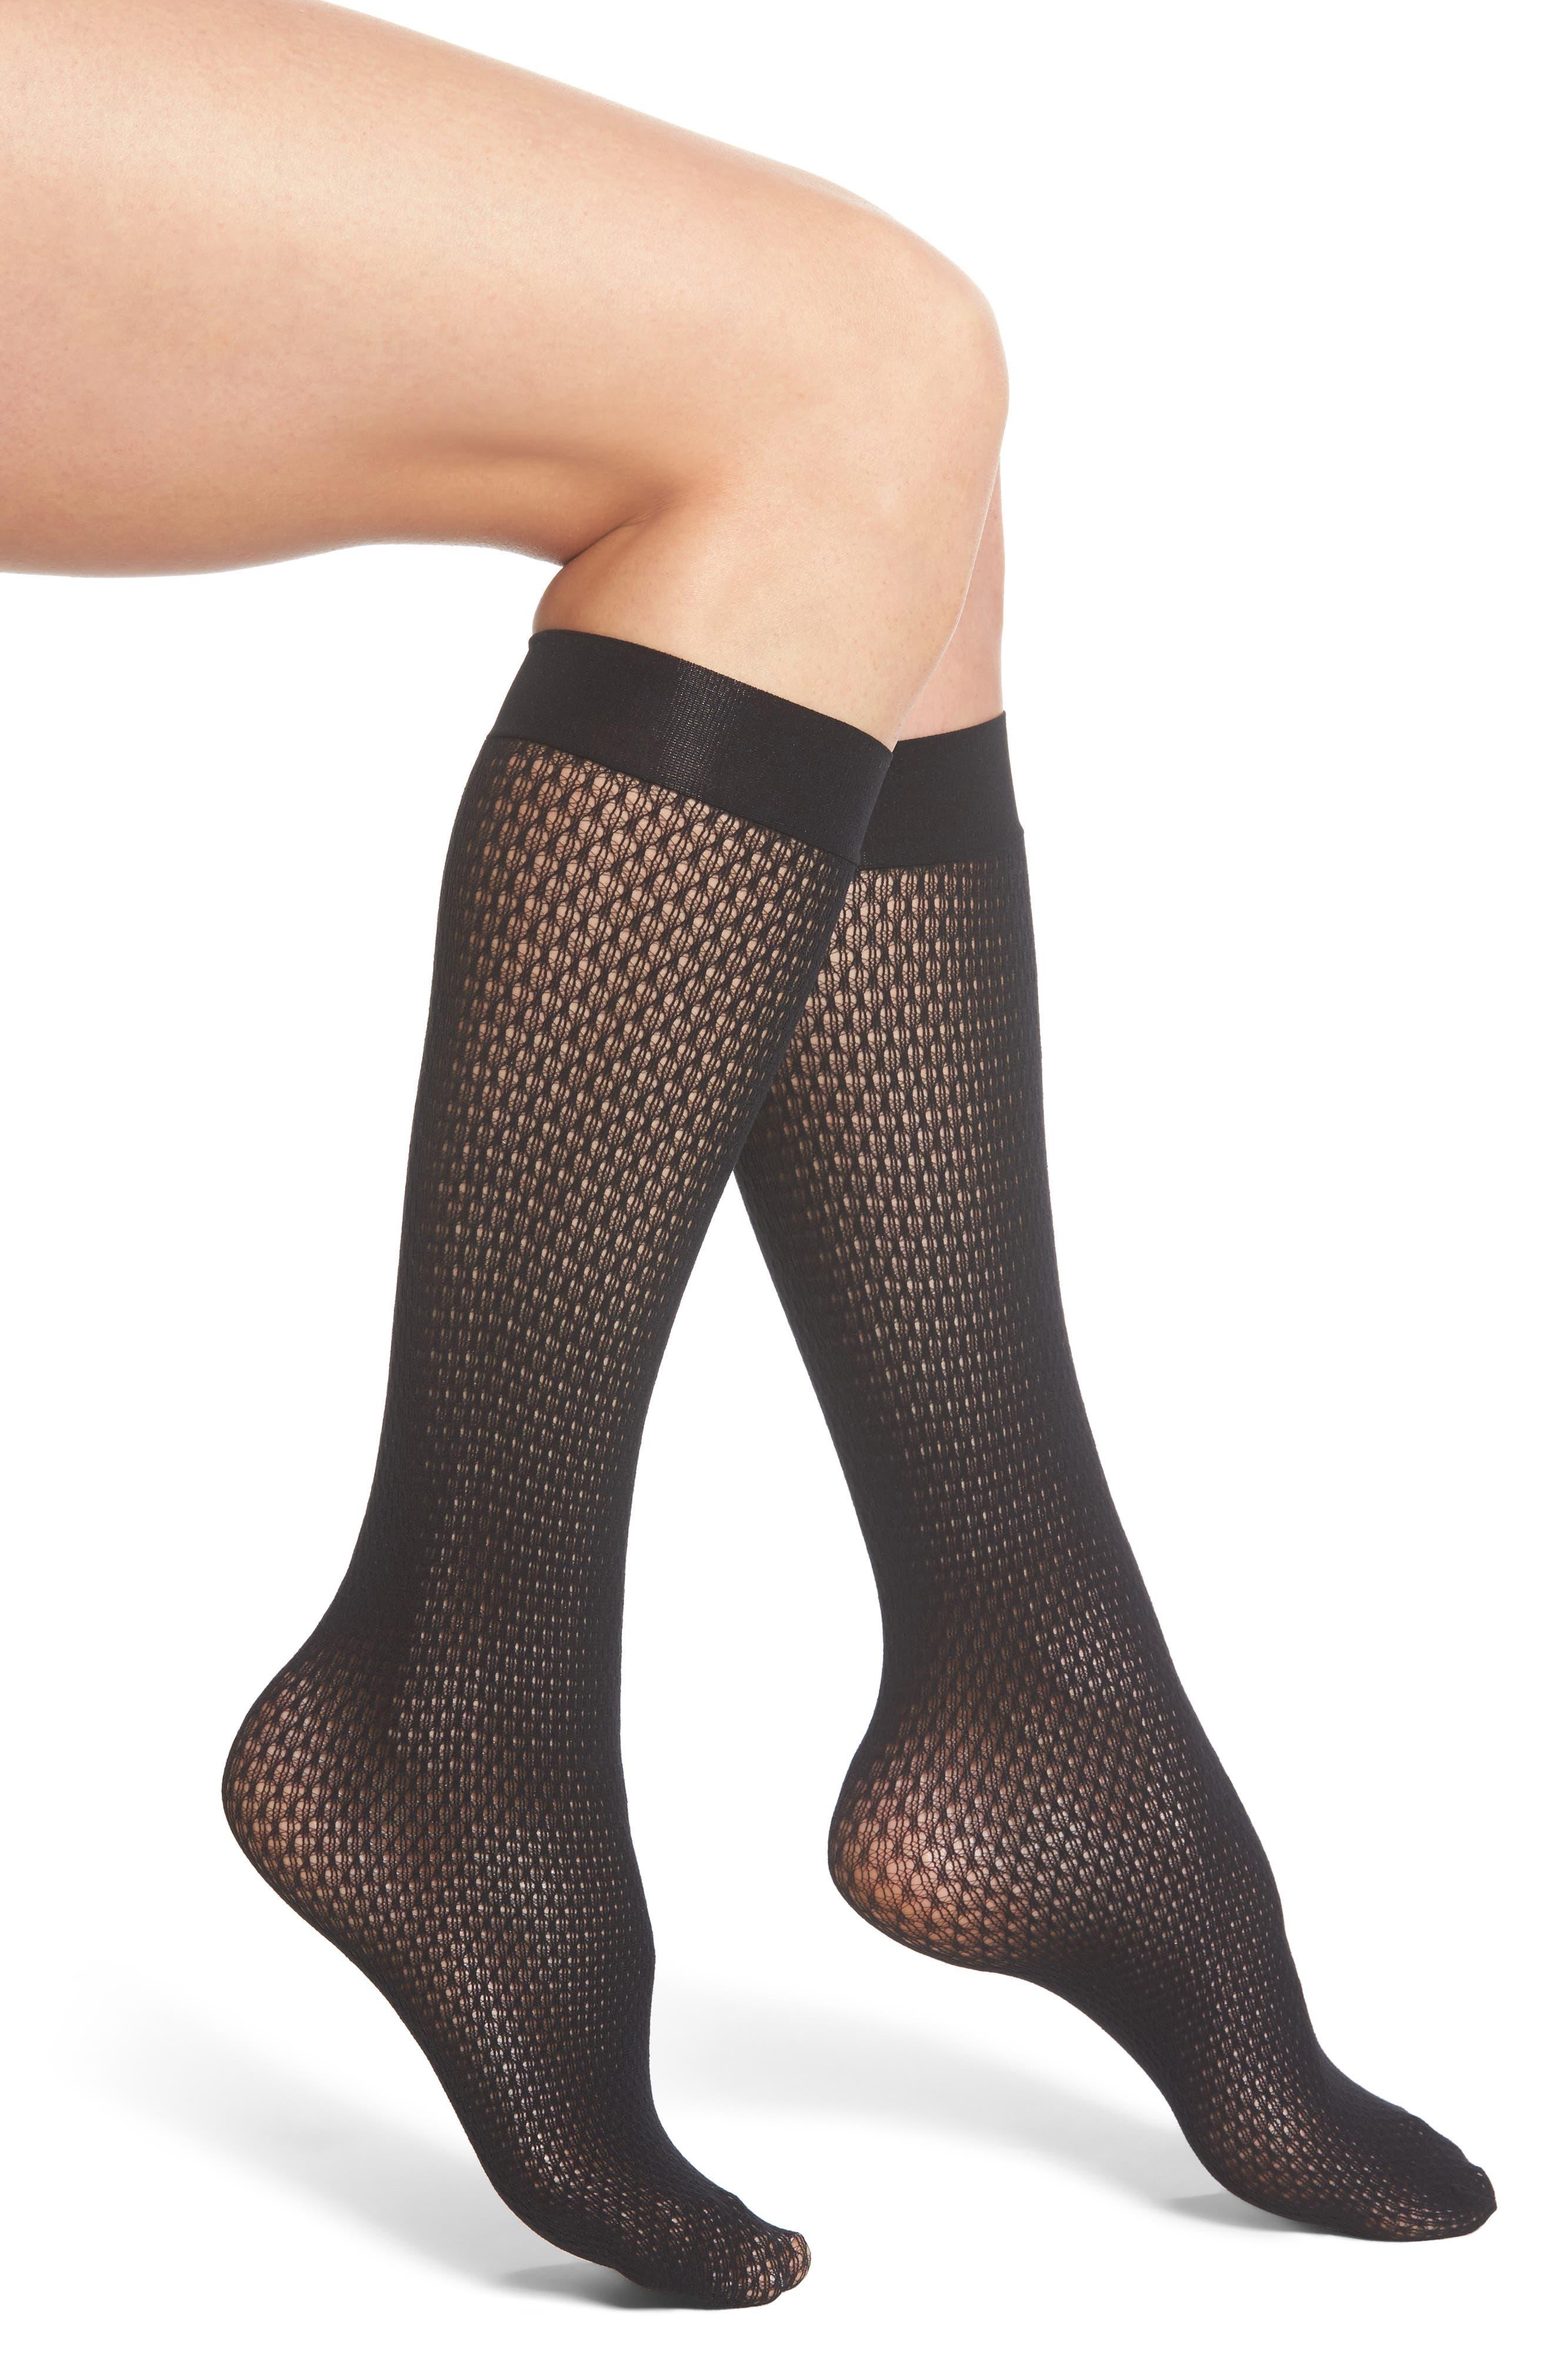 Rhomb Net Knee High Stockings,                         Main,                         color, Black